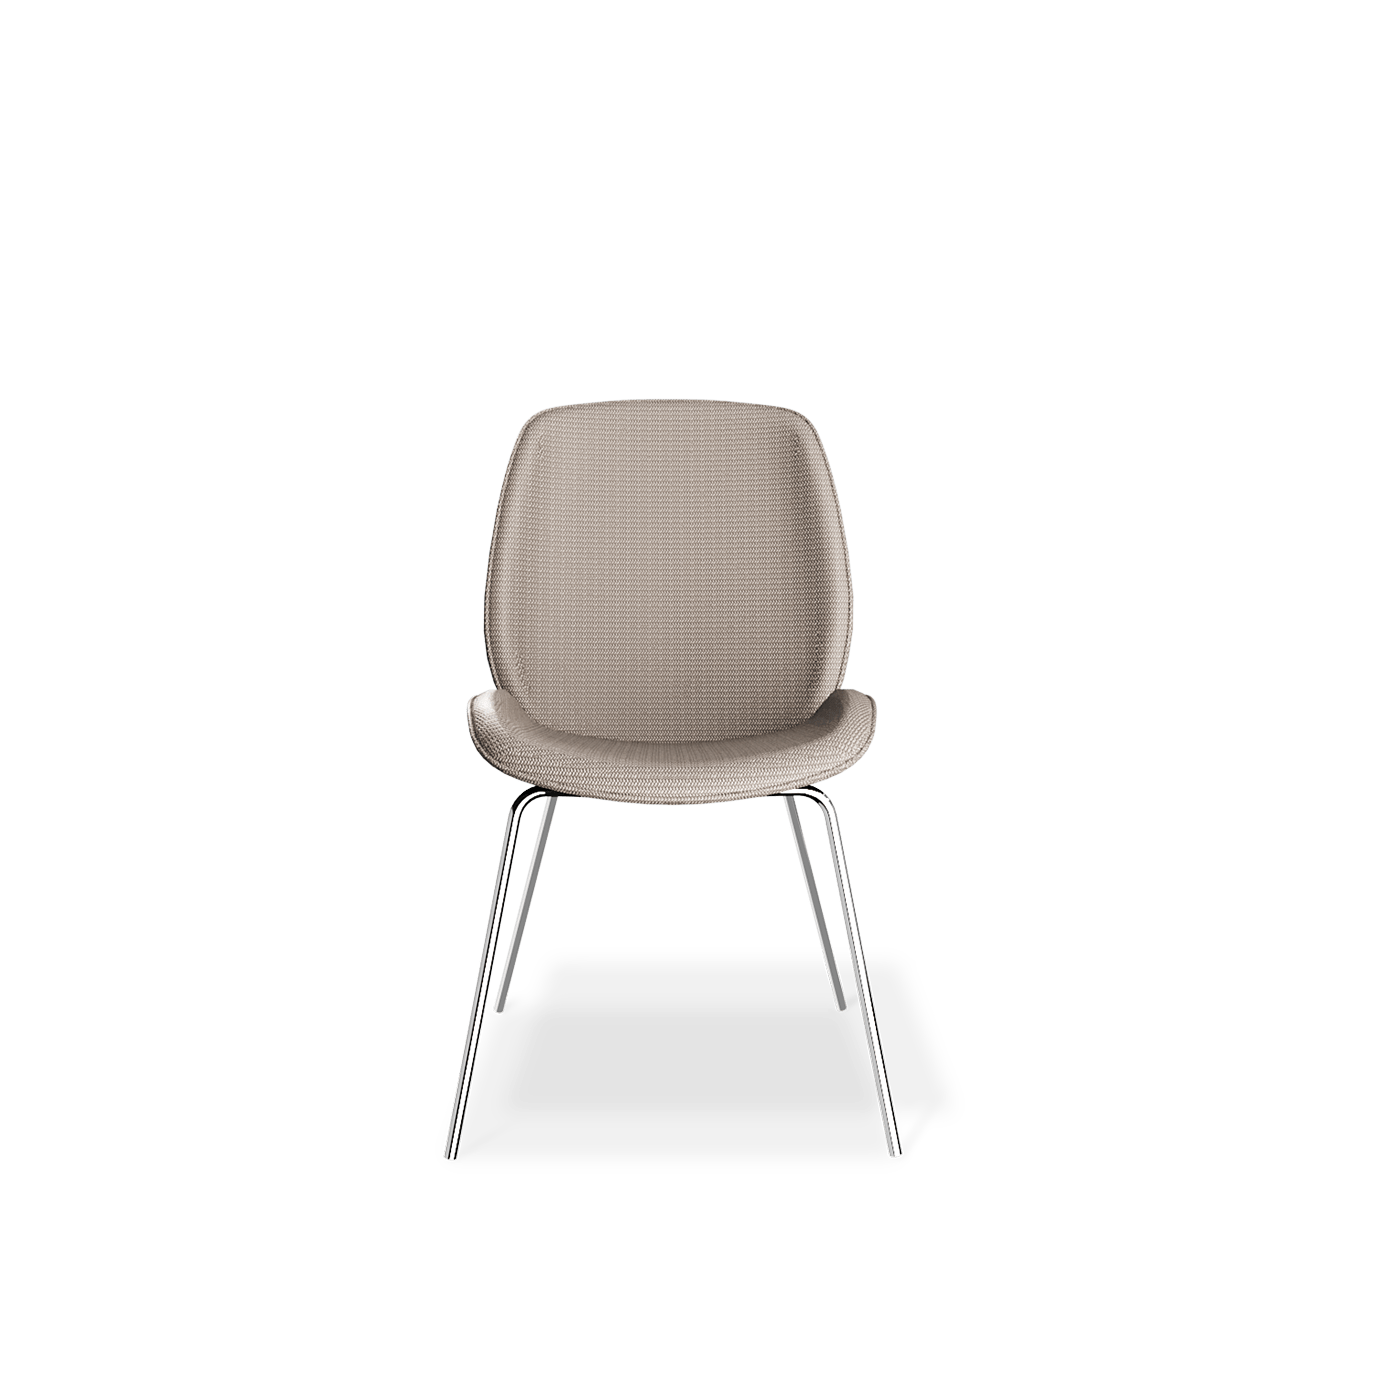 Ellender chair